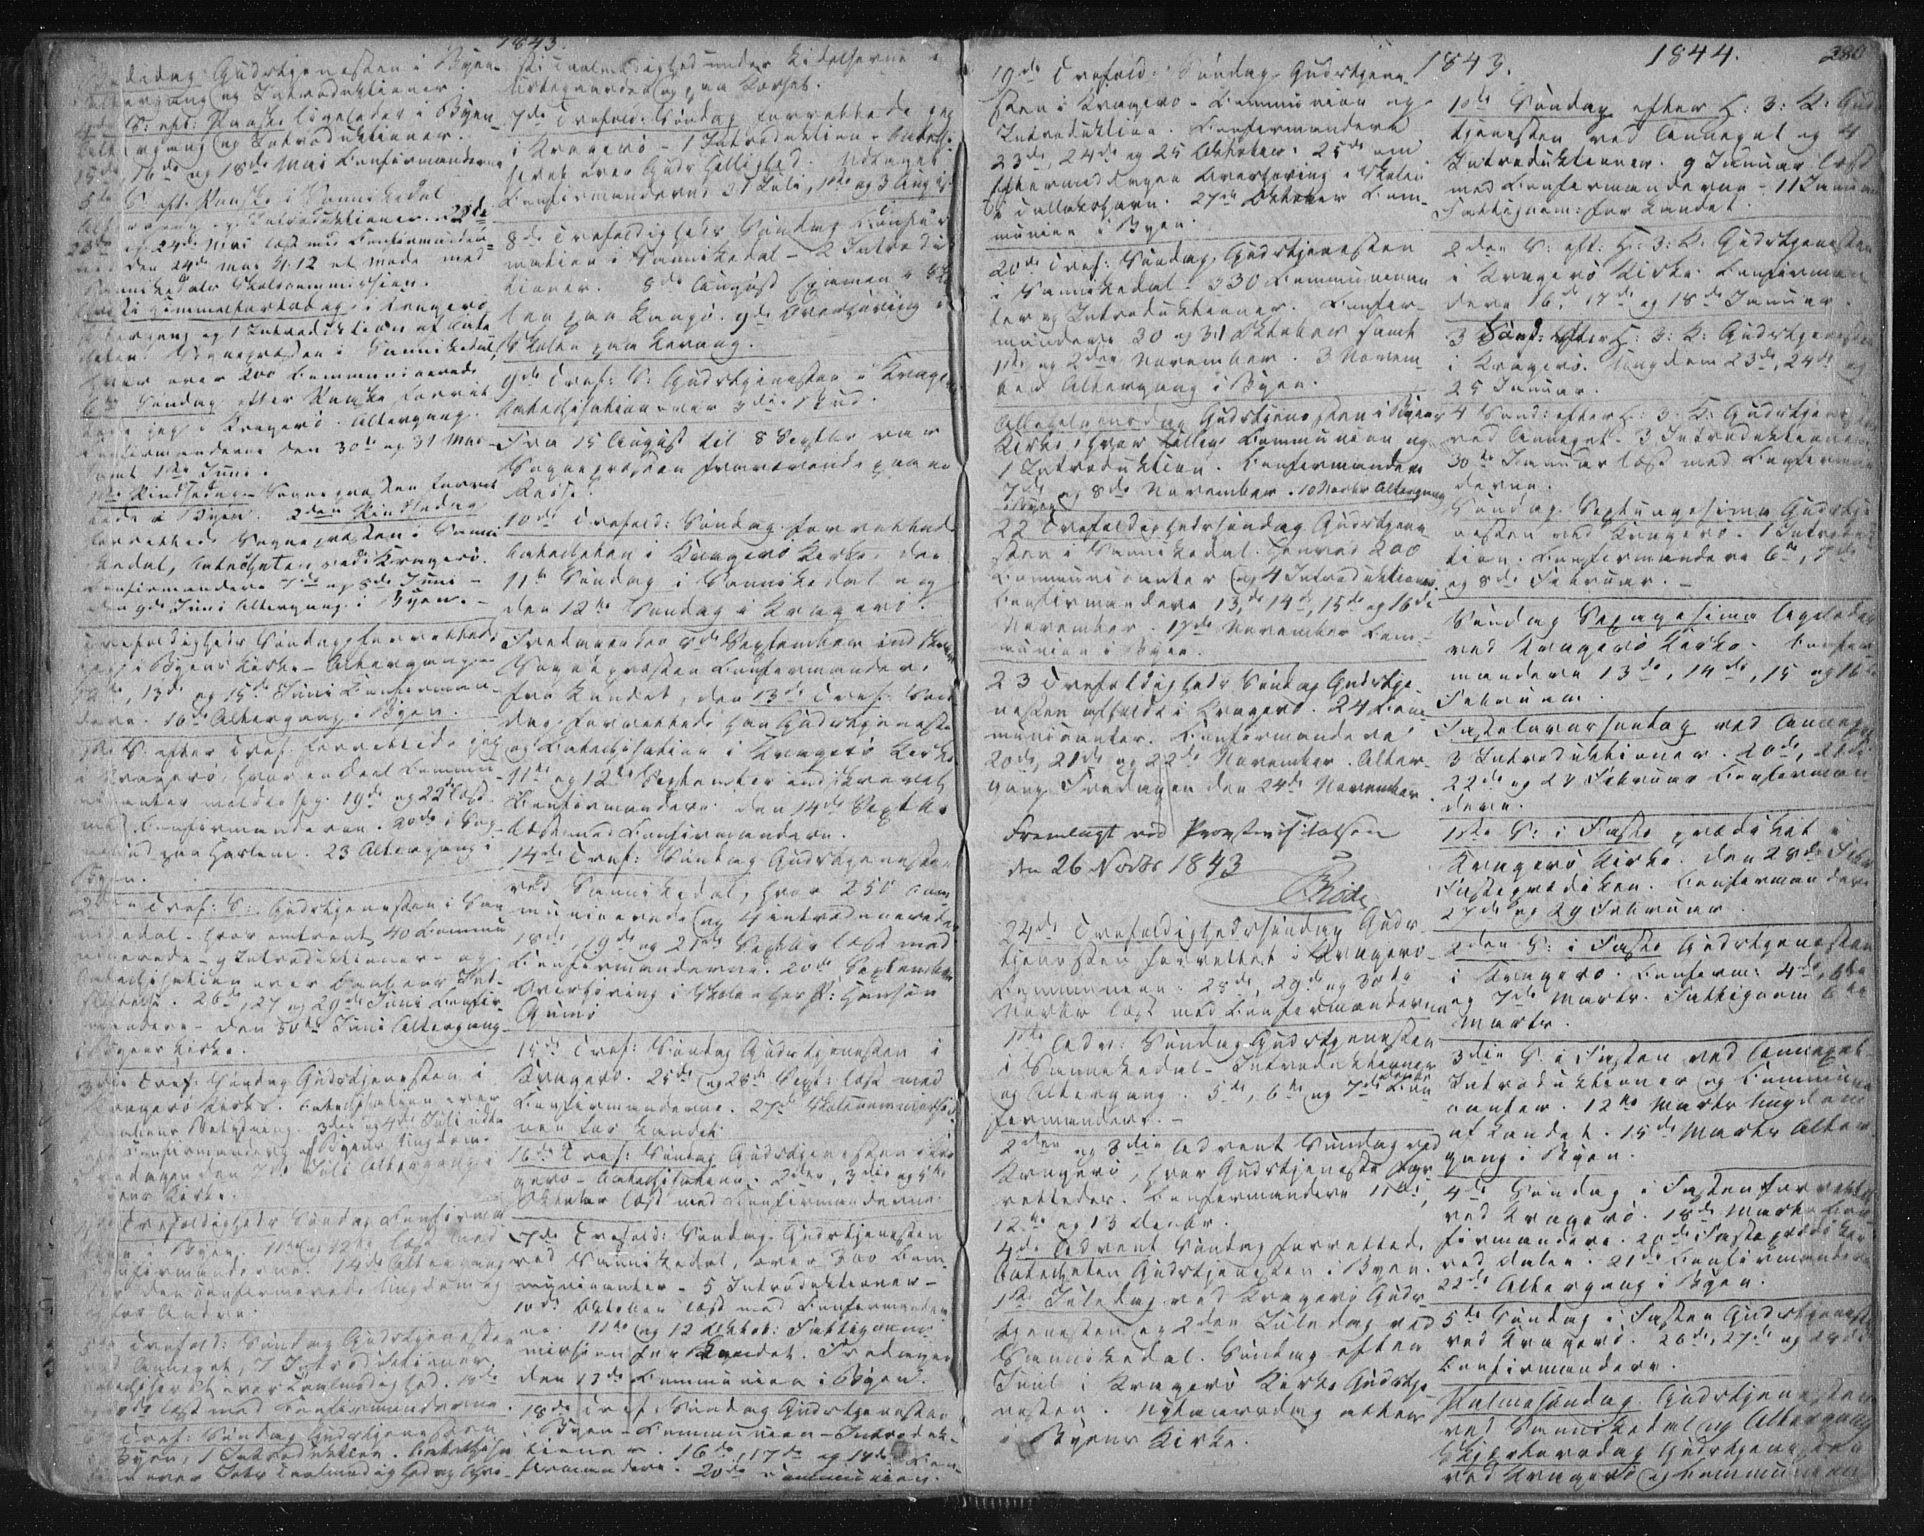 SAKO, Kragerø kirkebøker, F/Fa/L0005: Ministerialbok nr. 5, 1832-1847, s. 280